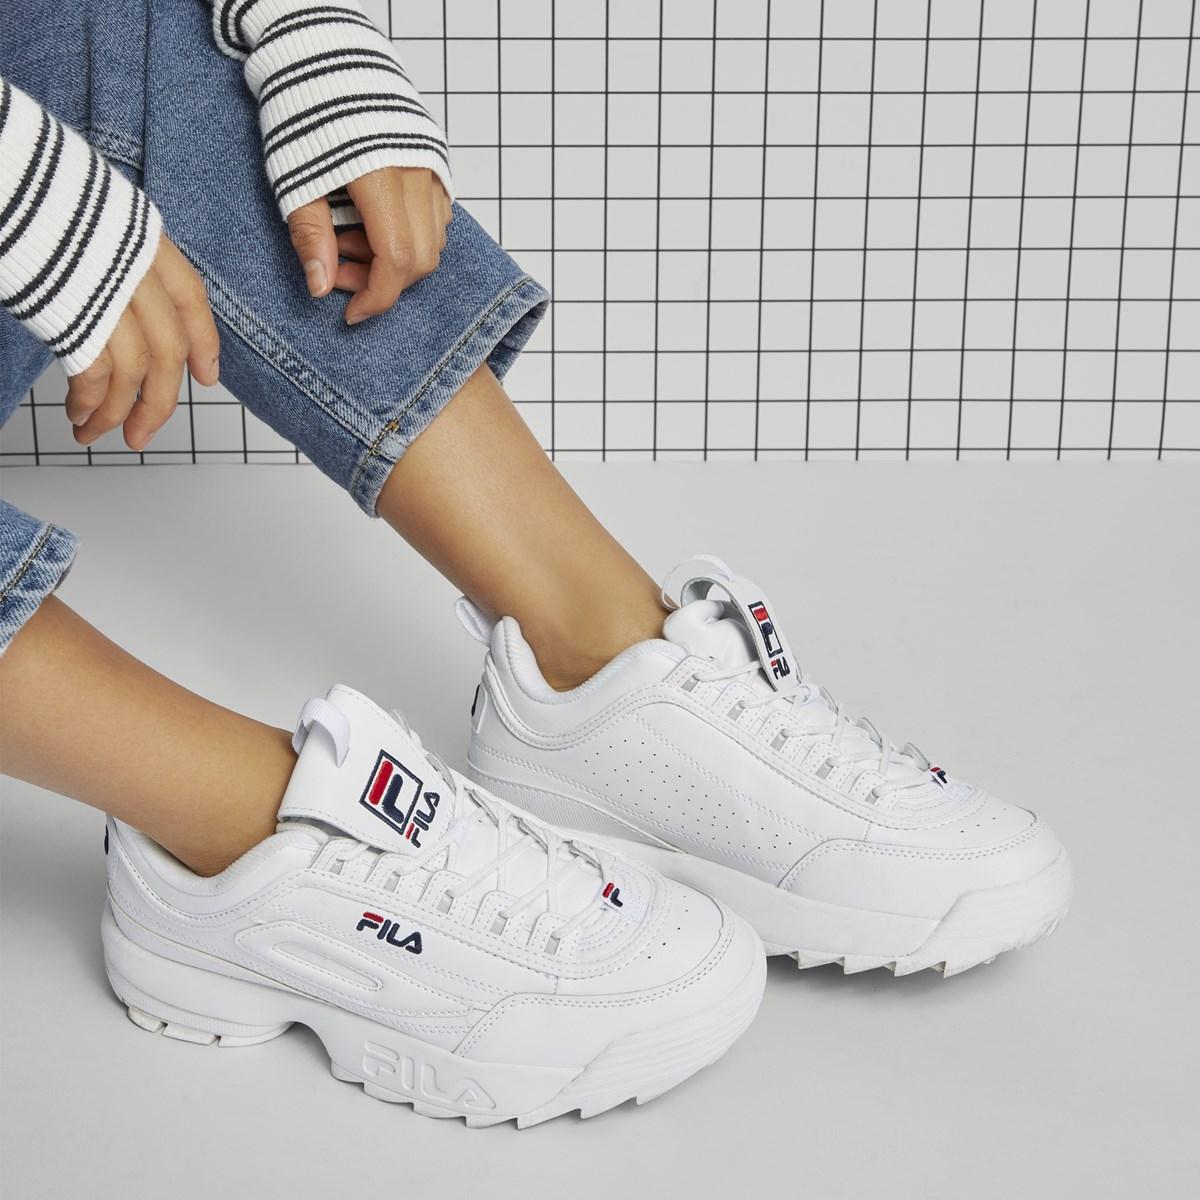 Fila-Disruptor-2-Premium-White-Feminino